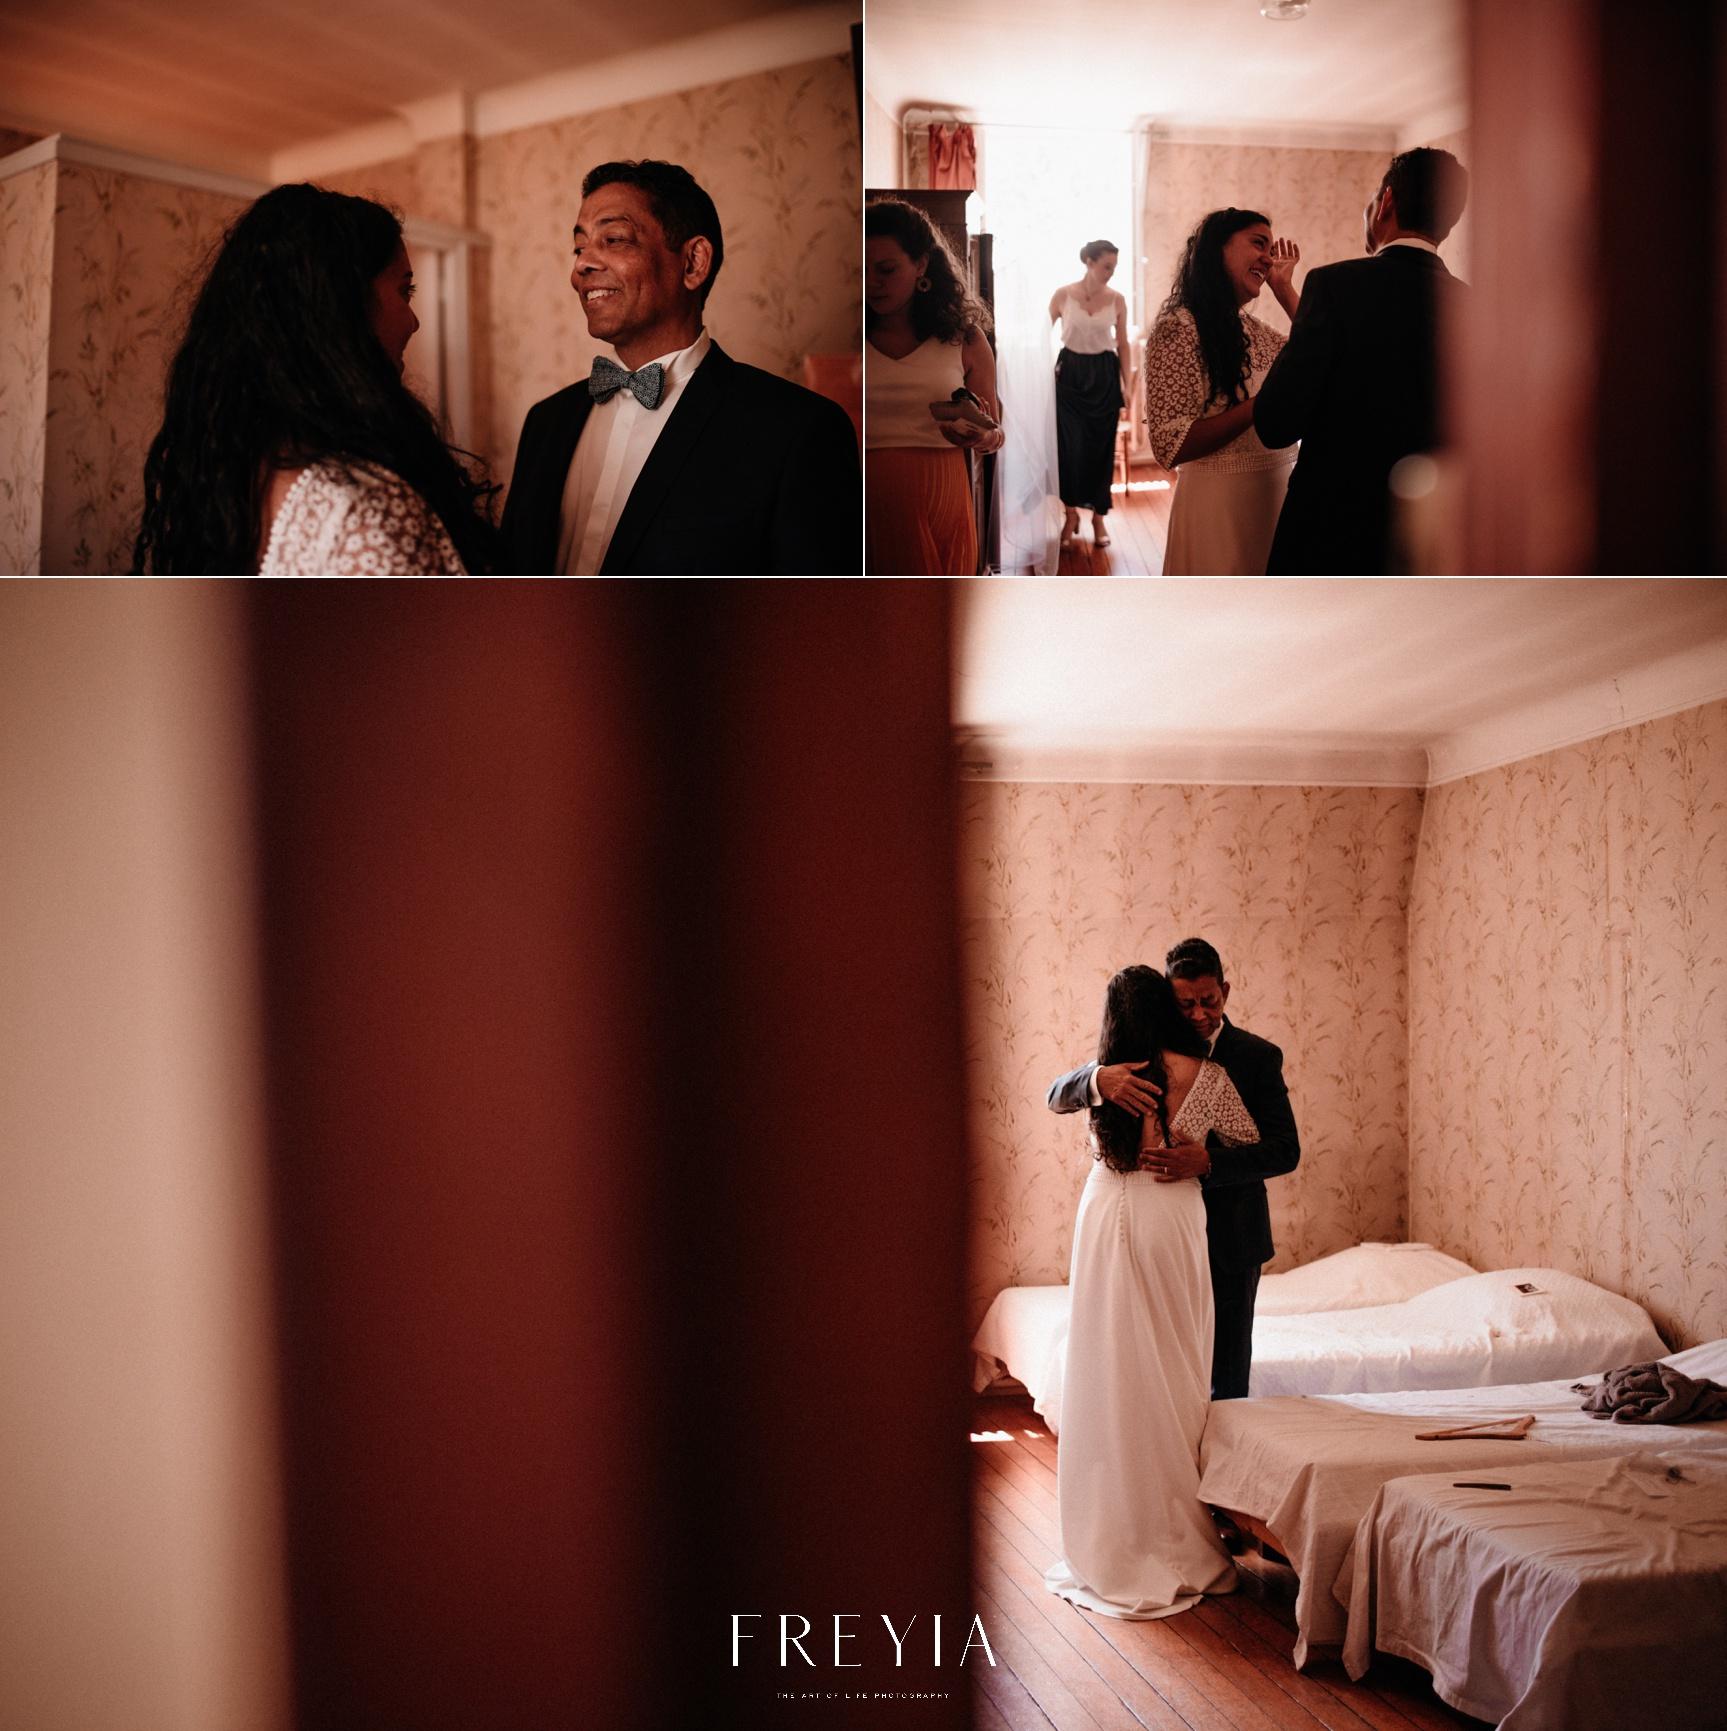 R + T |  mariage reportage alternatif moody intime minimaliste vintage naturel boho boheme |  PHOTOGRAPHE mariage PARIS france destination  | FREYIA photography_-90.jpg